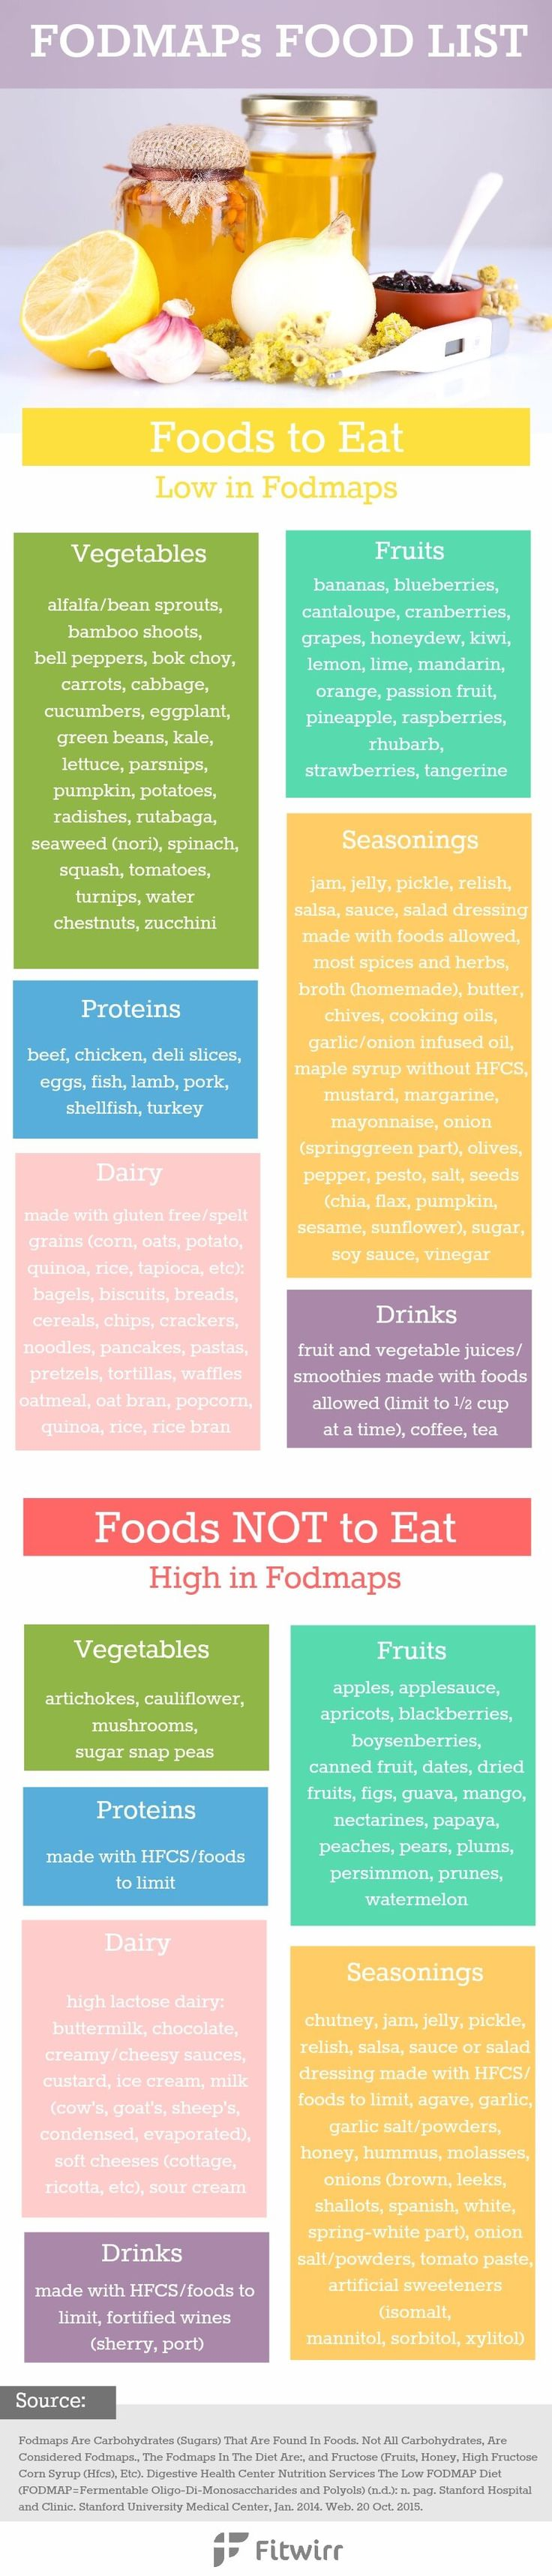 FODMAPs diet food list